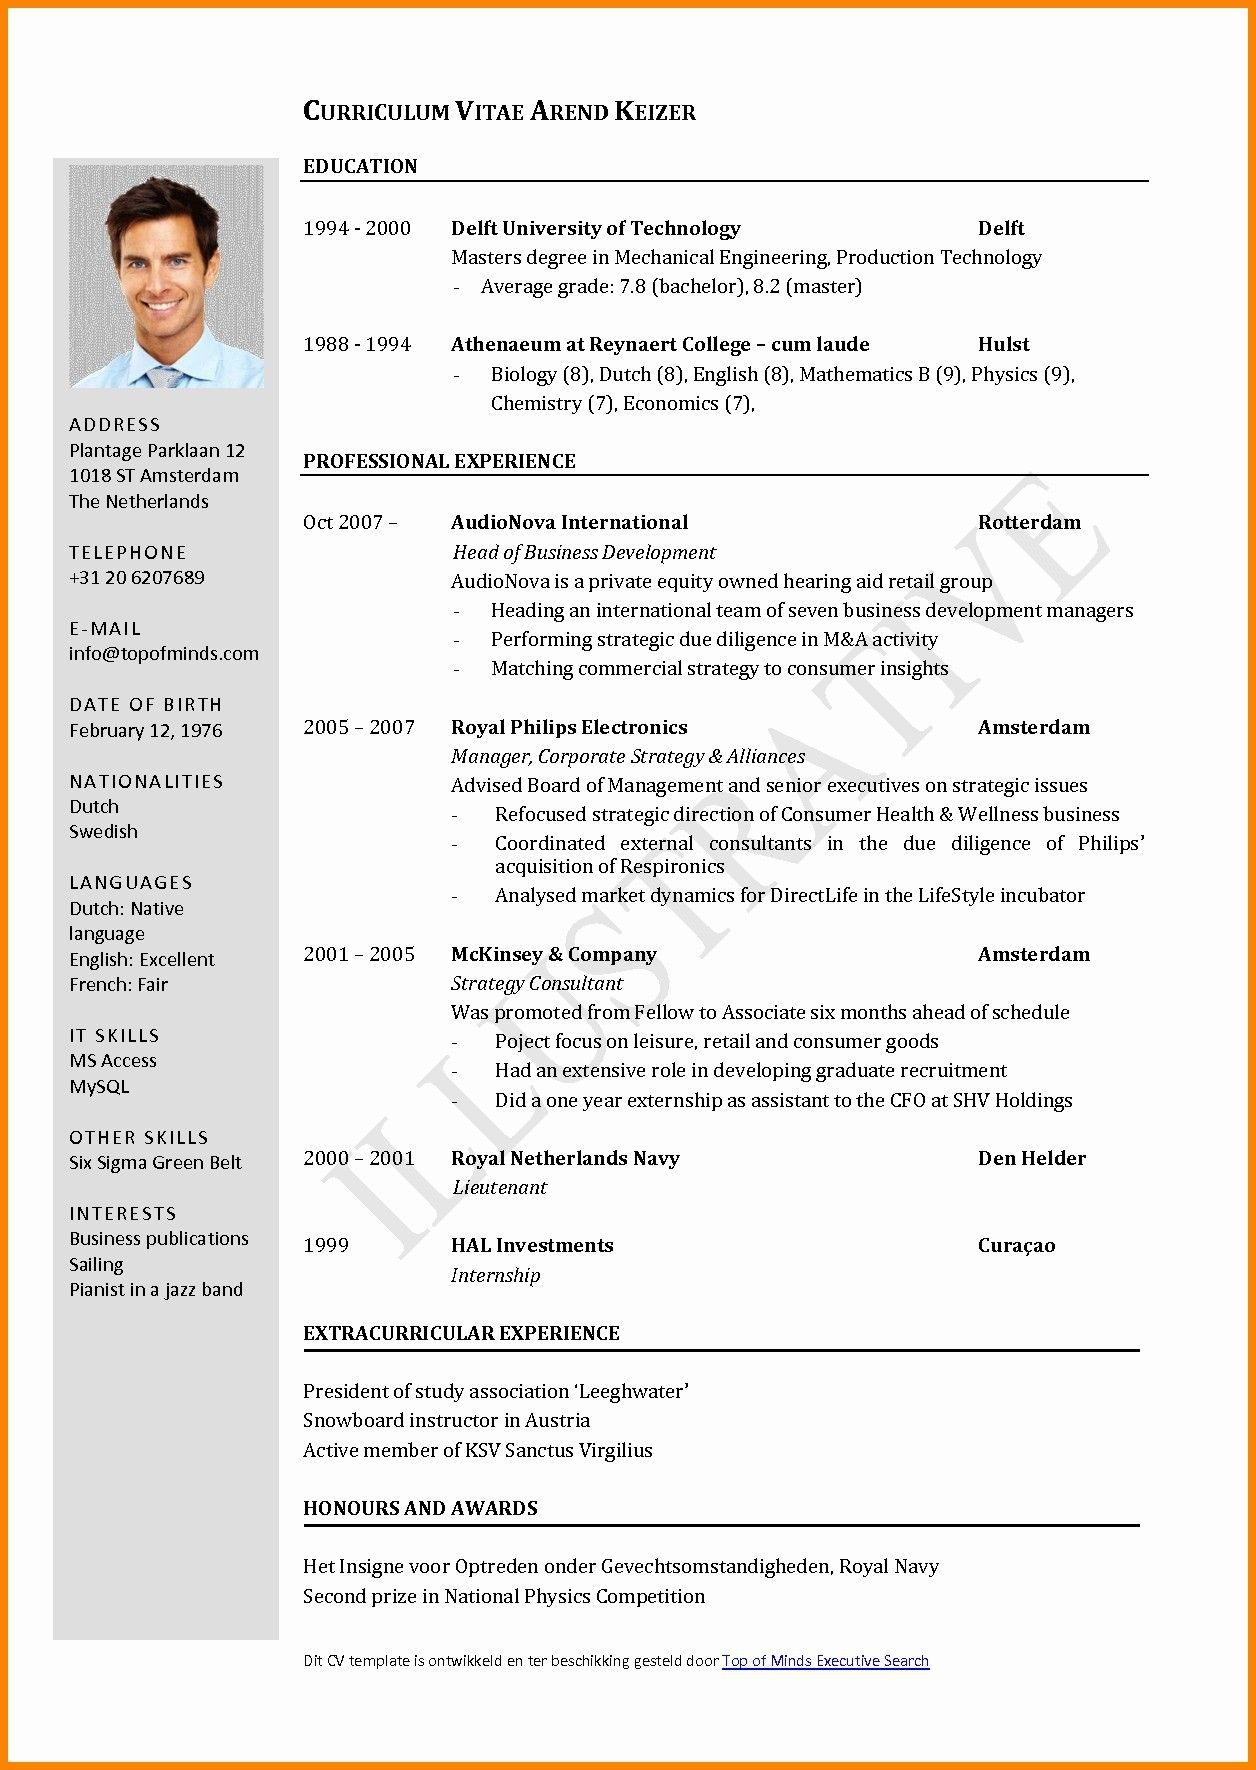 resume download ne demek